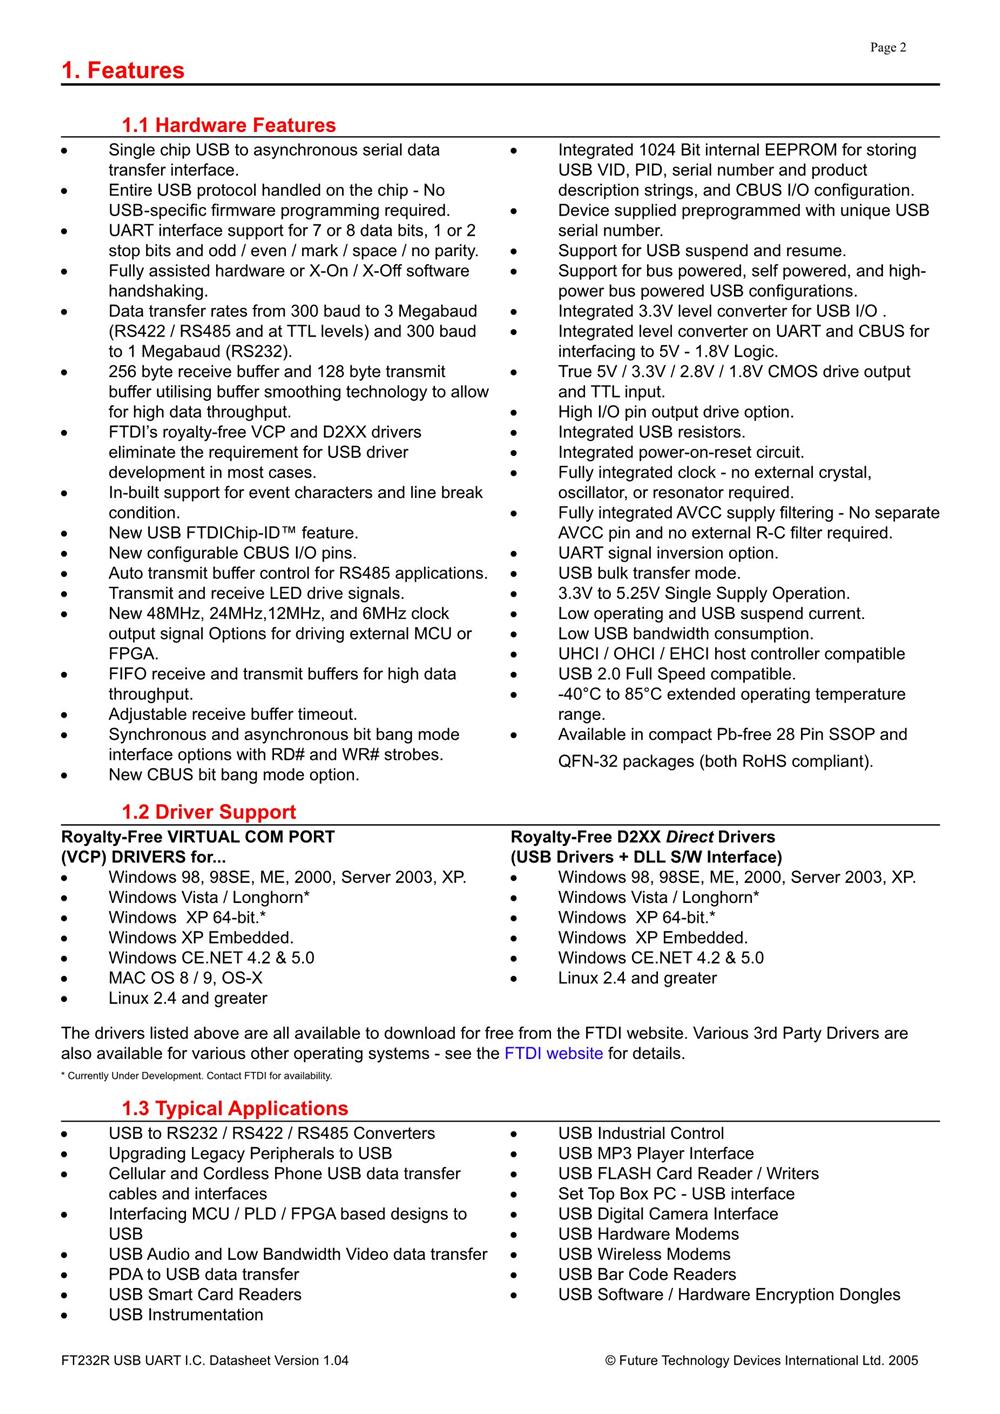 FT232RL's pdf picture 2